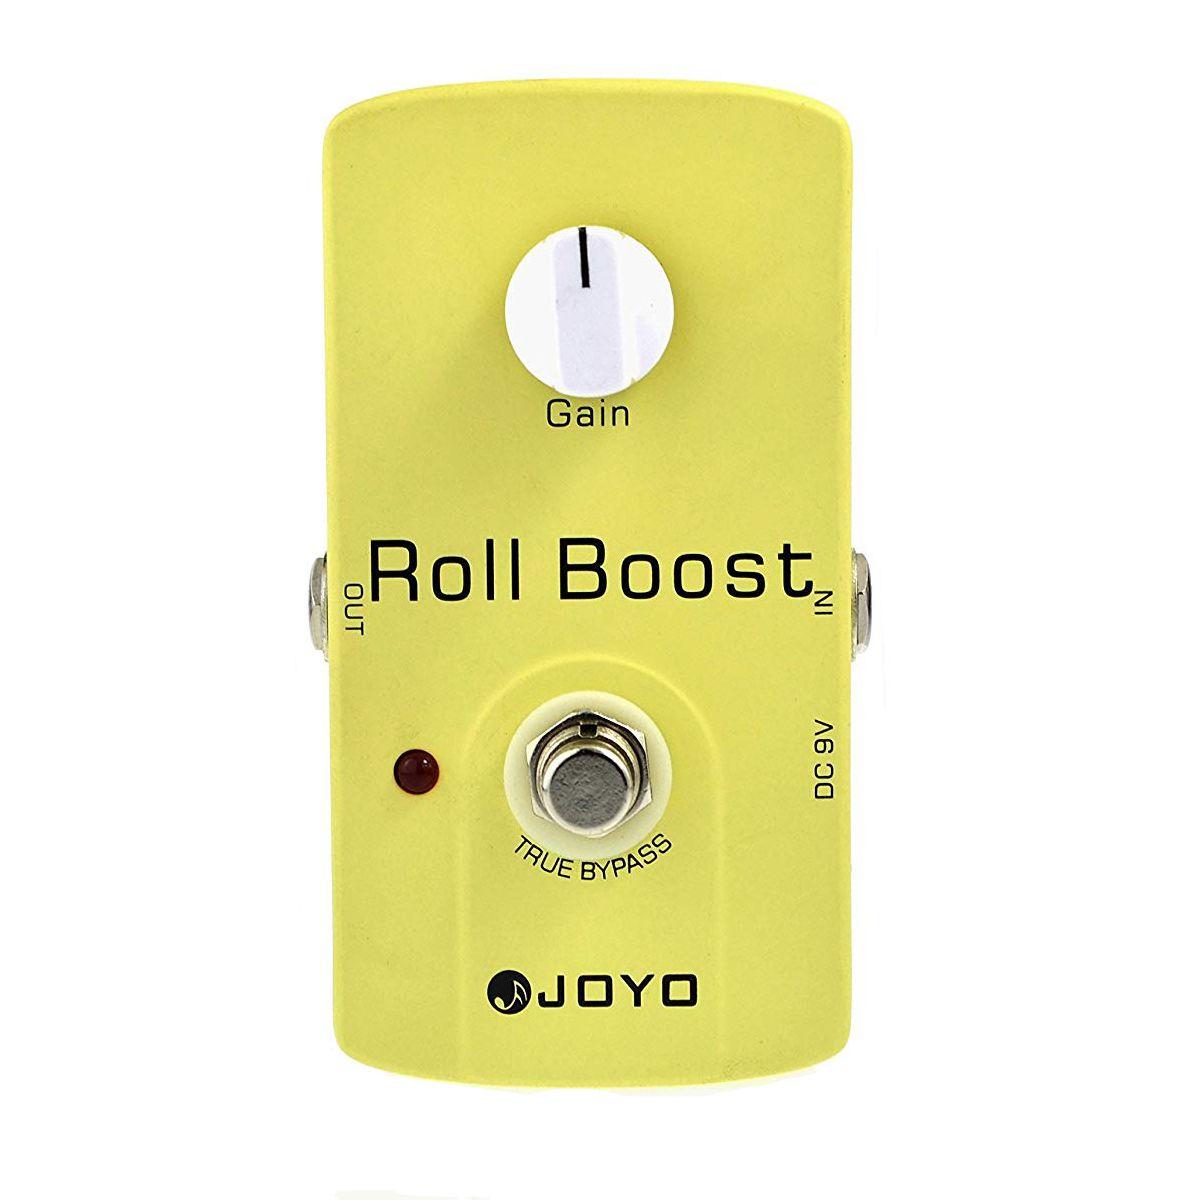 Pedal de Efeito Joyo JF-38 Roll Boost para Guitarra